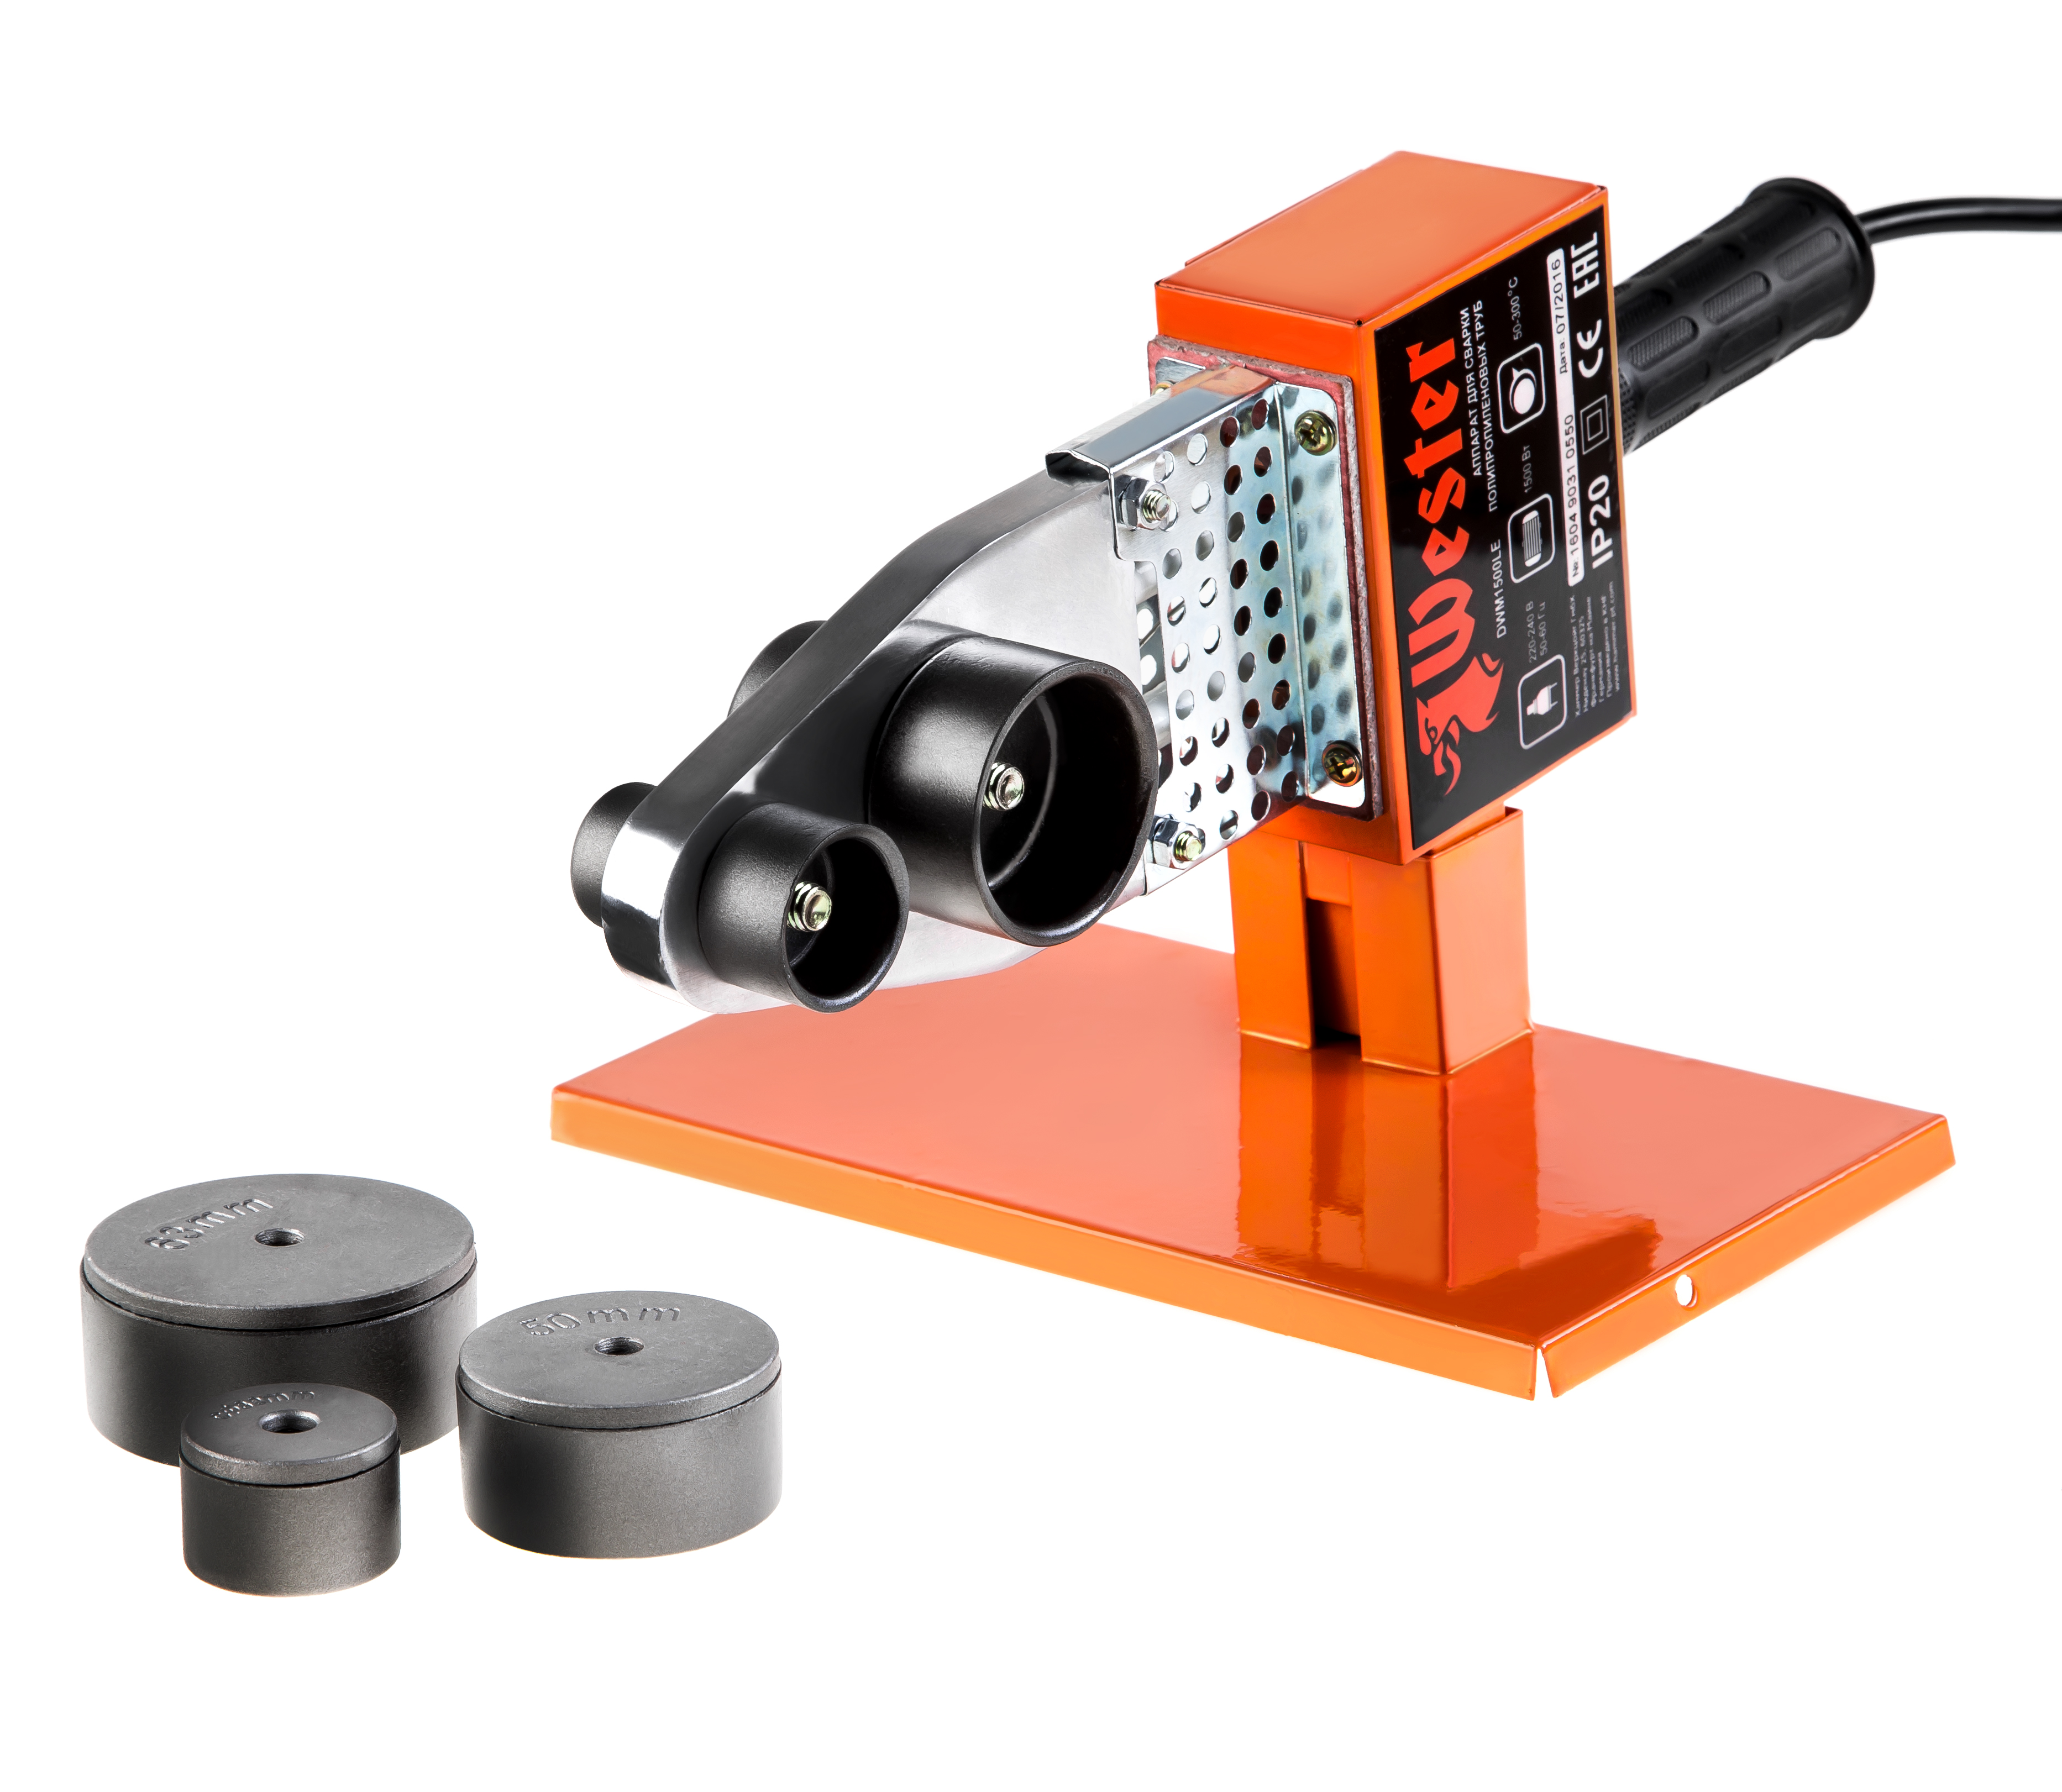 Аппарат для сварки пластиковых труб Wester Dwm1500le электроды для сварки wester ано 4 3 0мм 1кг